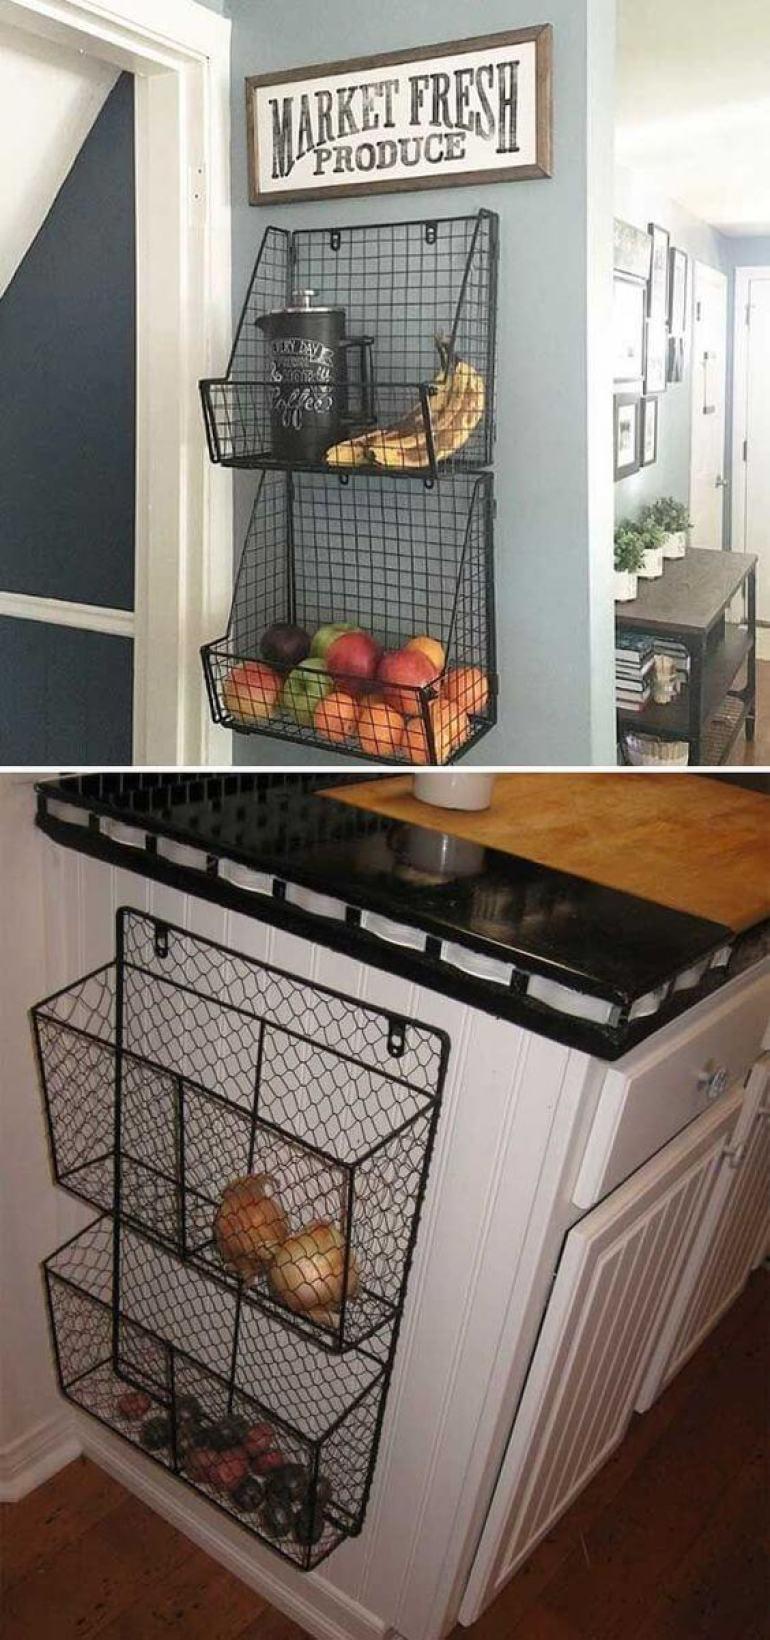 small kitchen decor ideas - 11. Wire Baskets For Kitchen Storage - Harptimes.com